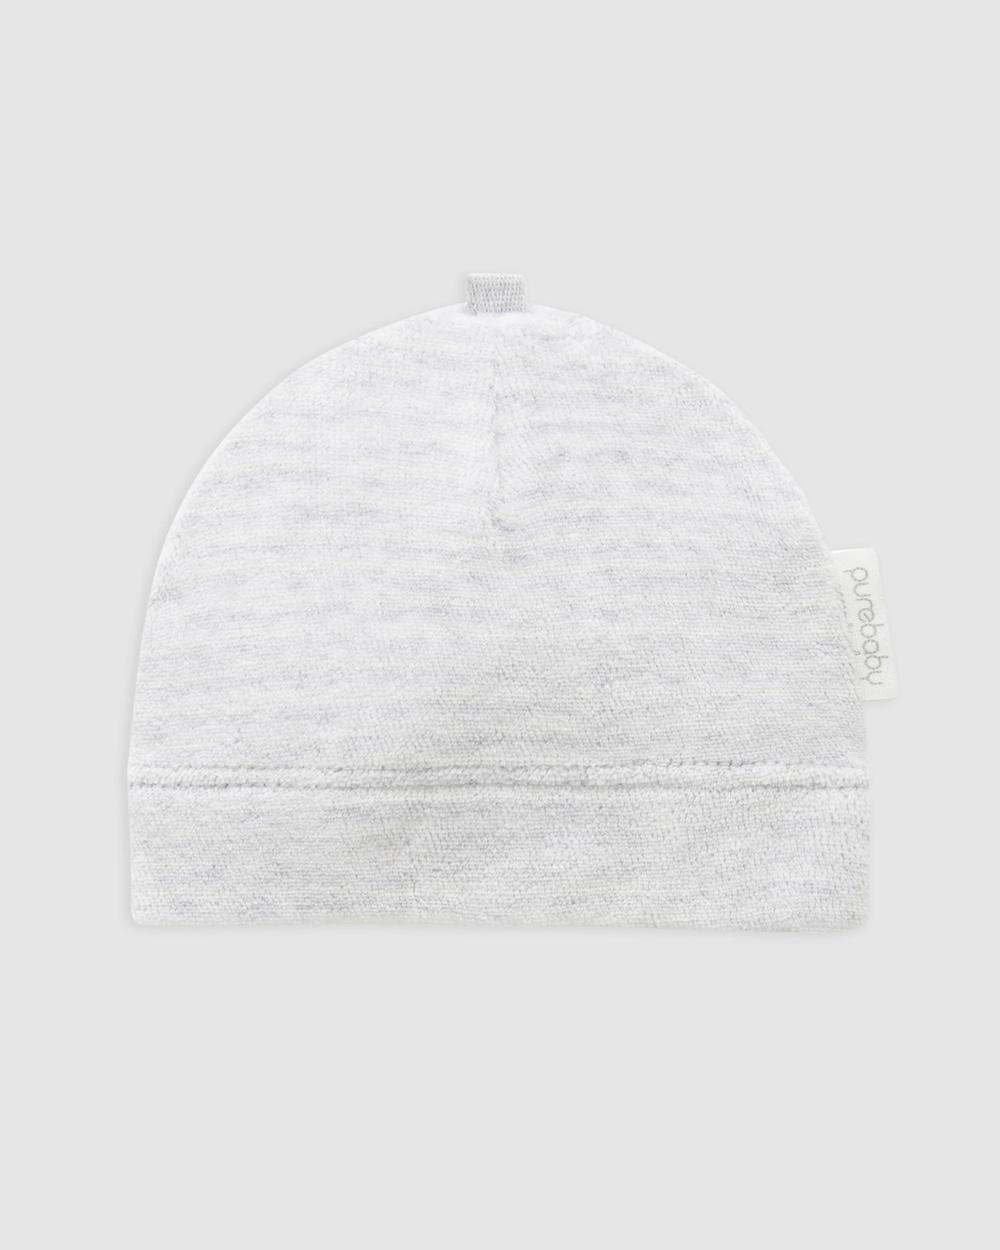 Purebaby Premie Hat Babies Headwear Pale Grey Stripe